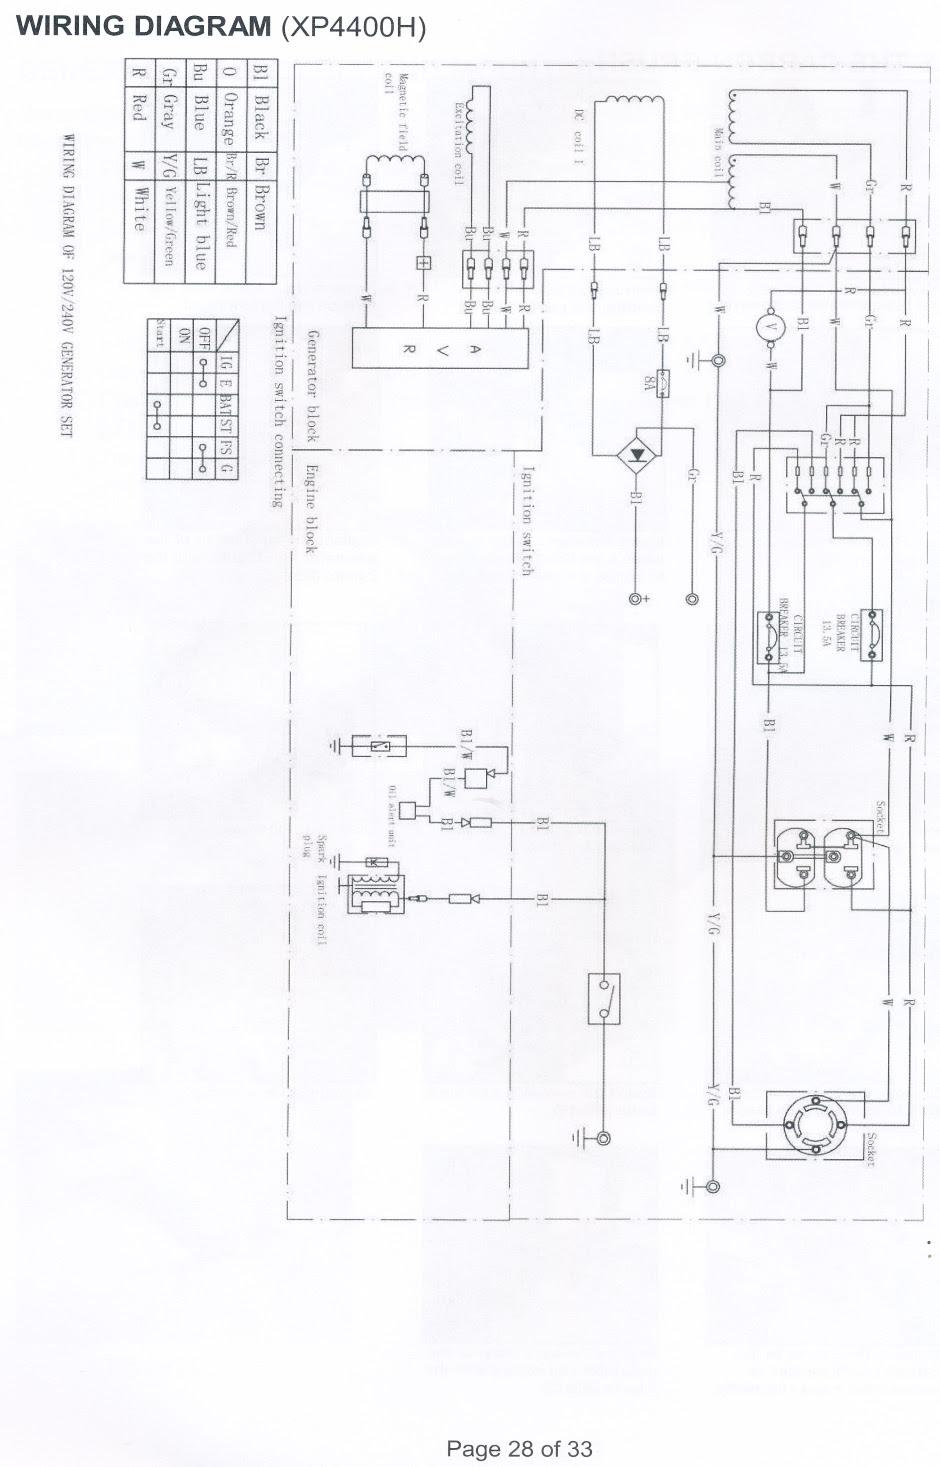 Predator Generator Wiring Diagram | Predator Wiring Diagrams |  | Fuse Wiring